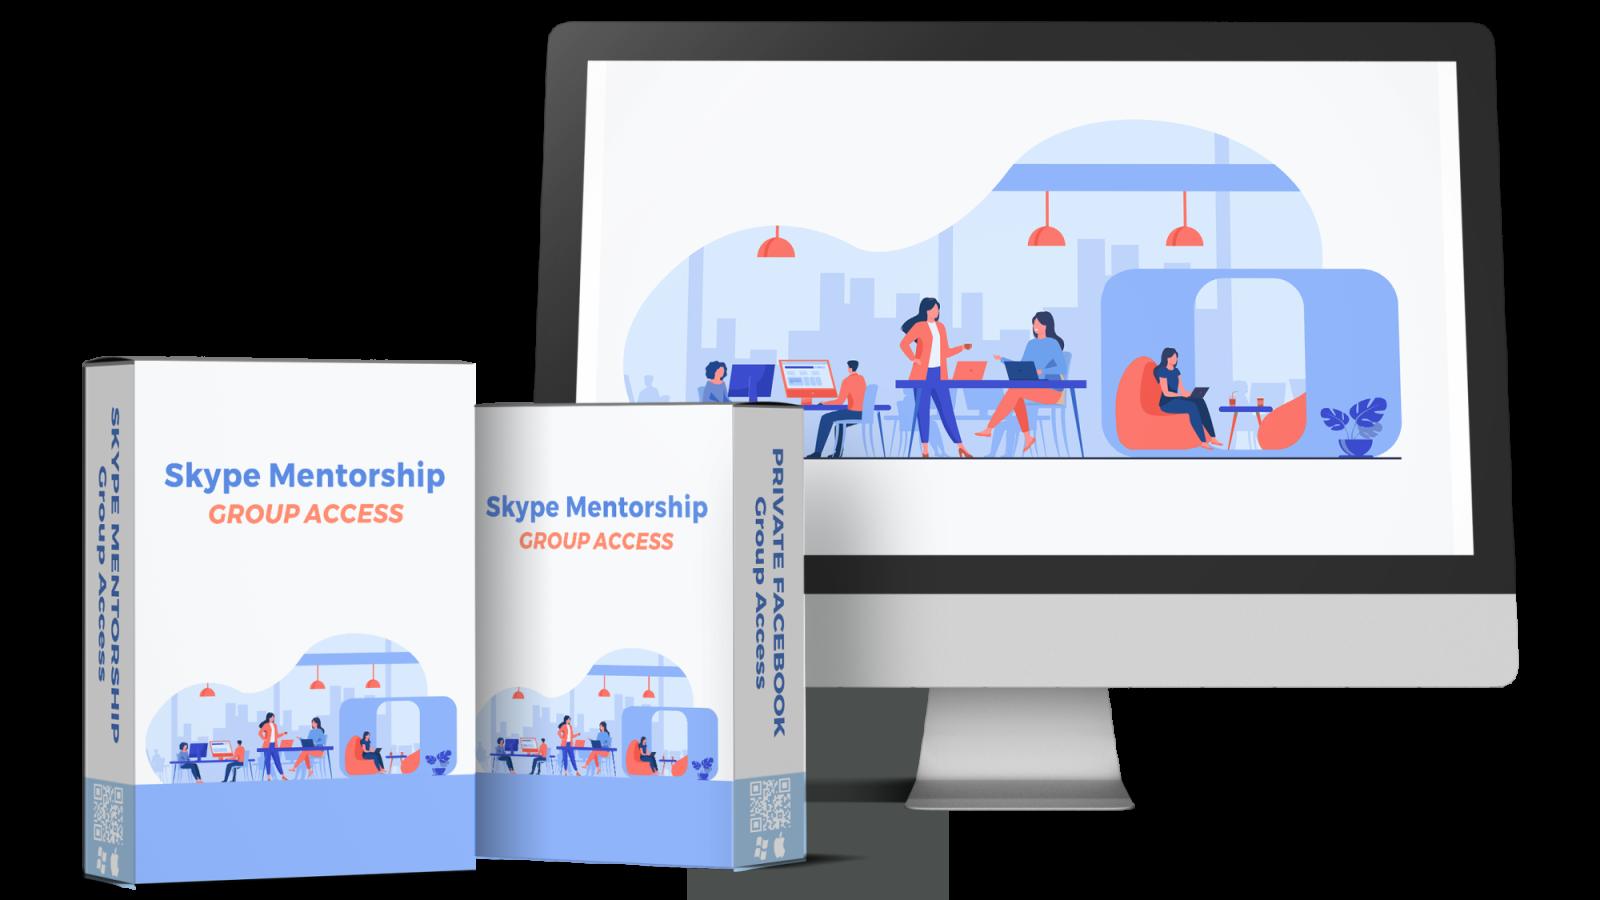 Doodle Maker Bonus 2 - Skype Mentorship